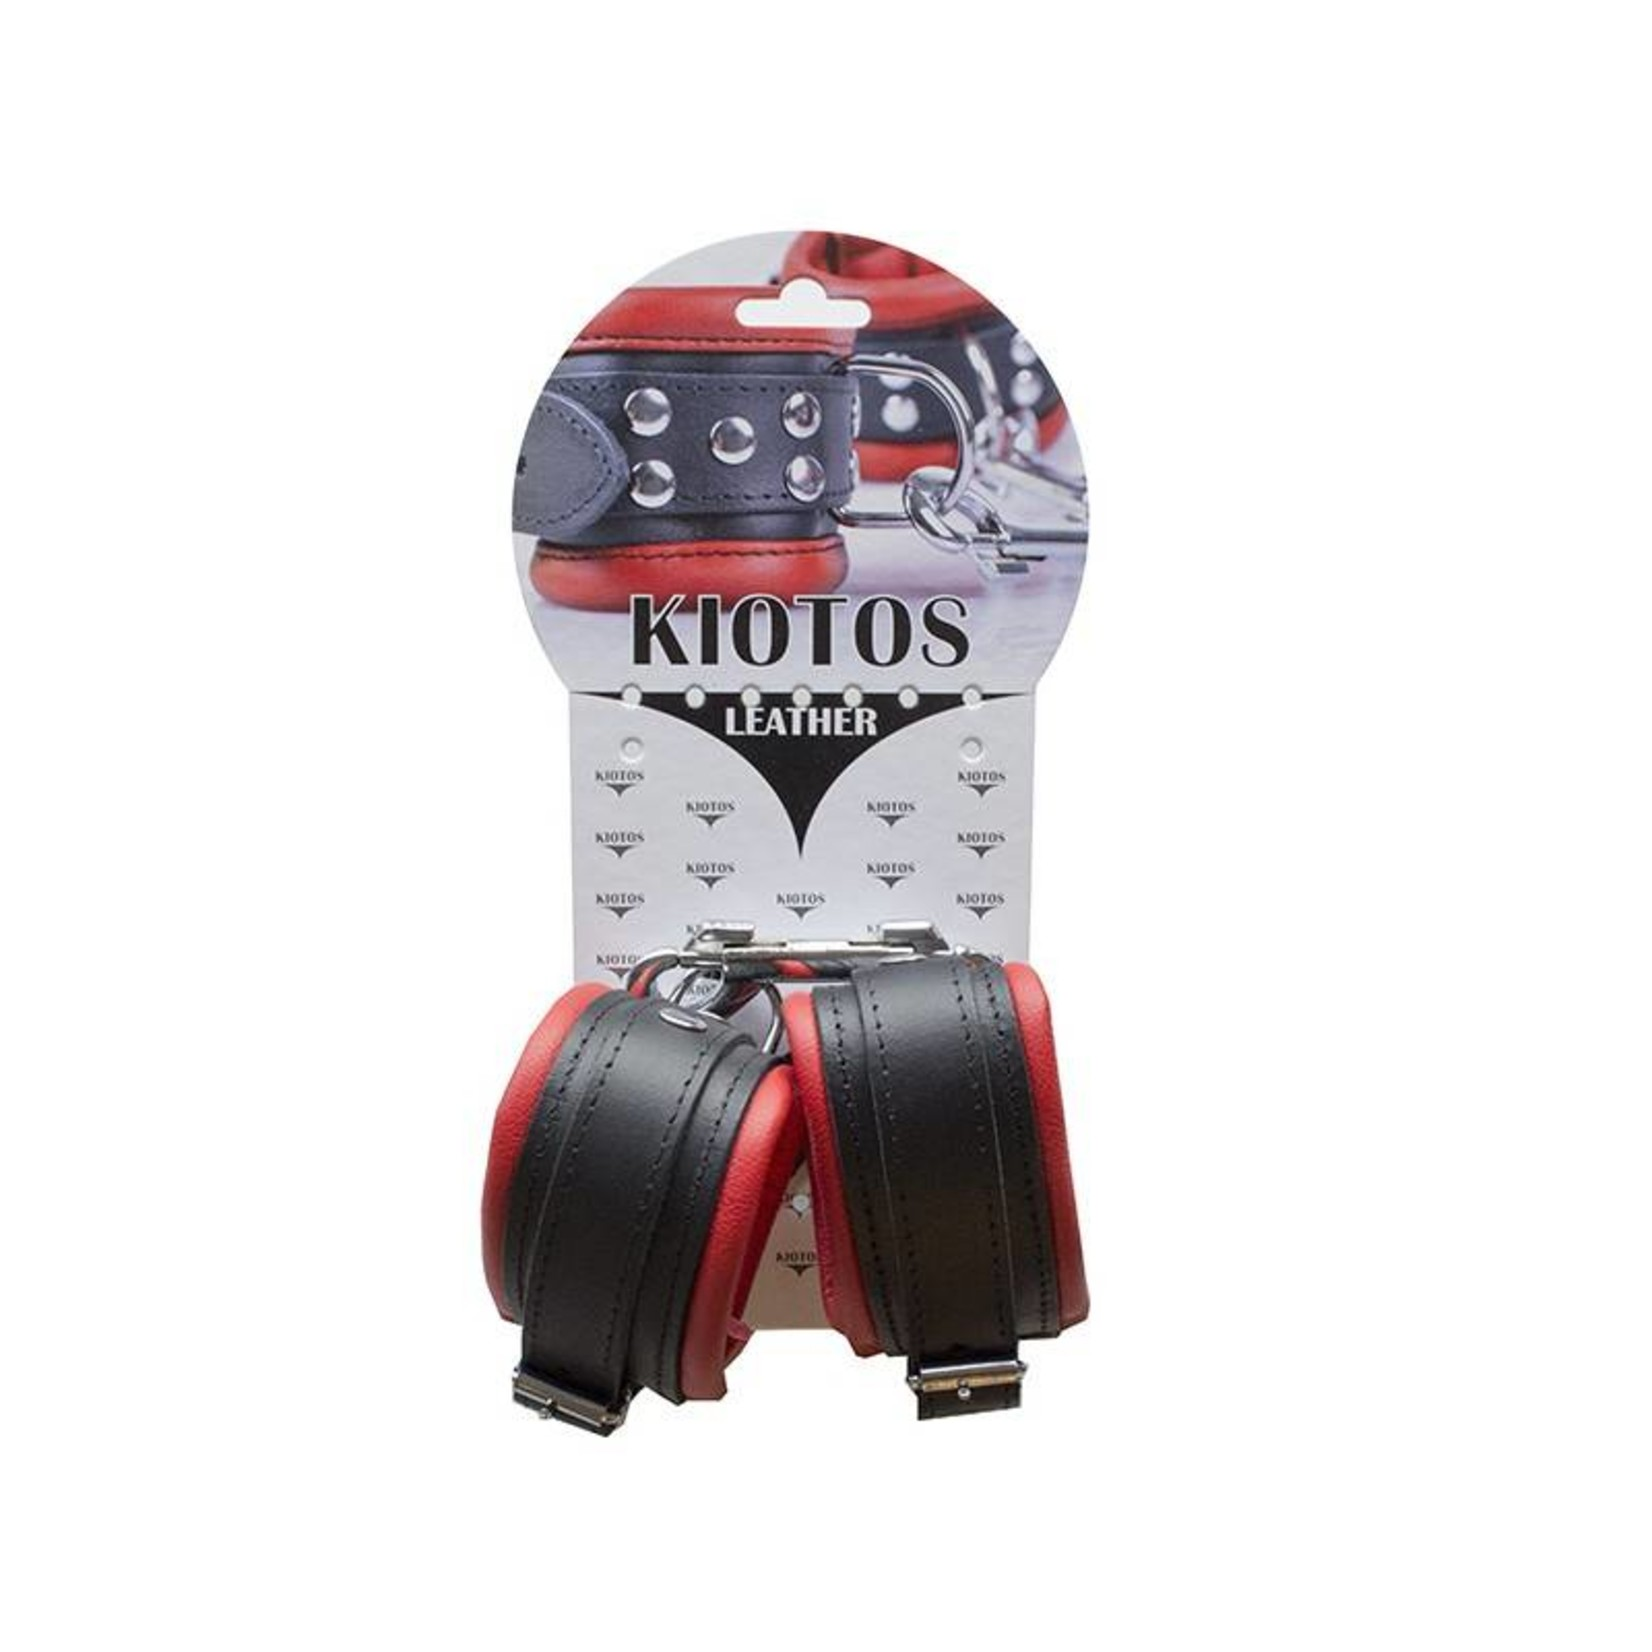 KIOTOS Leather Anklecuffs 5 cm - Red